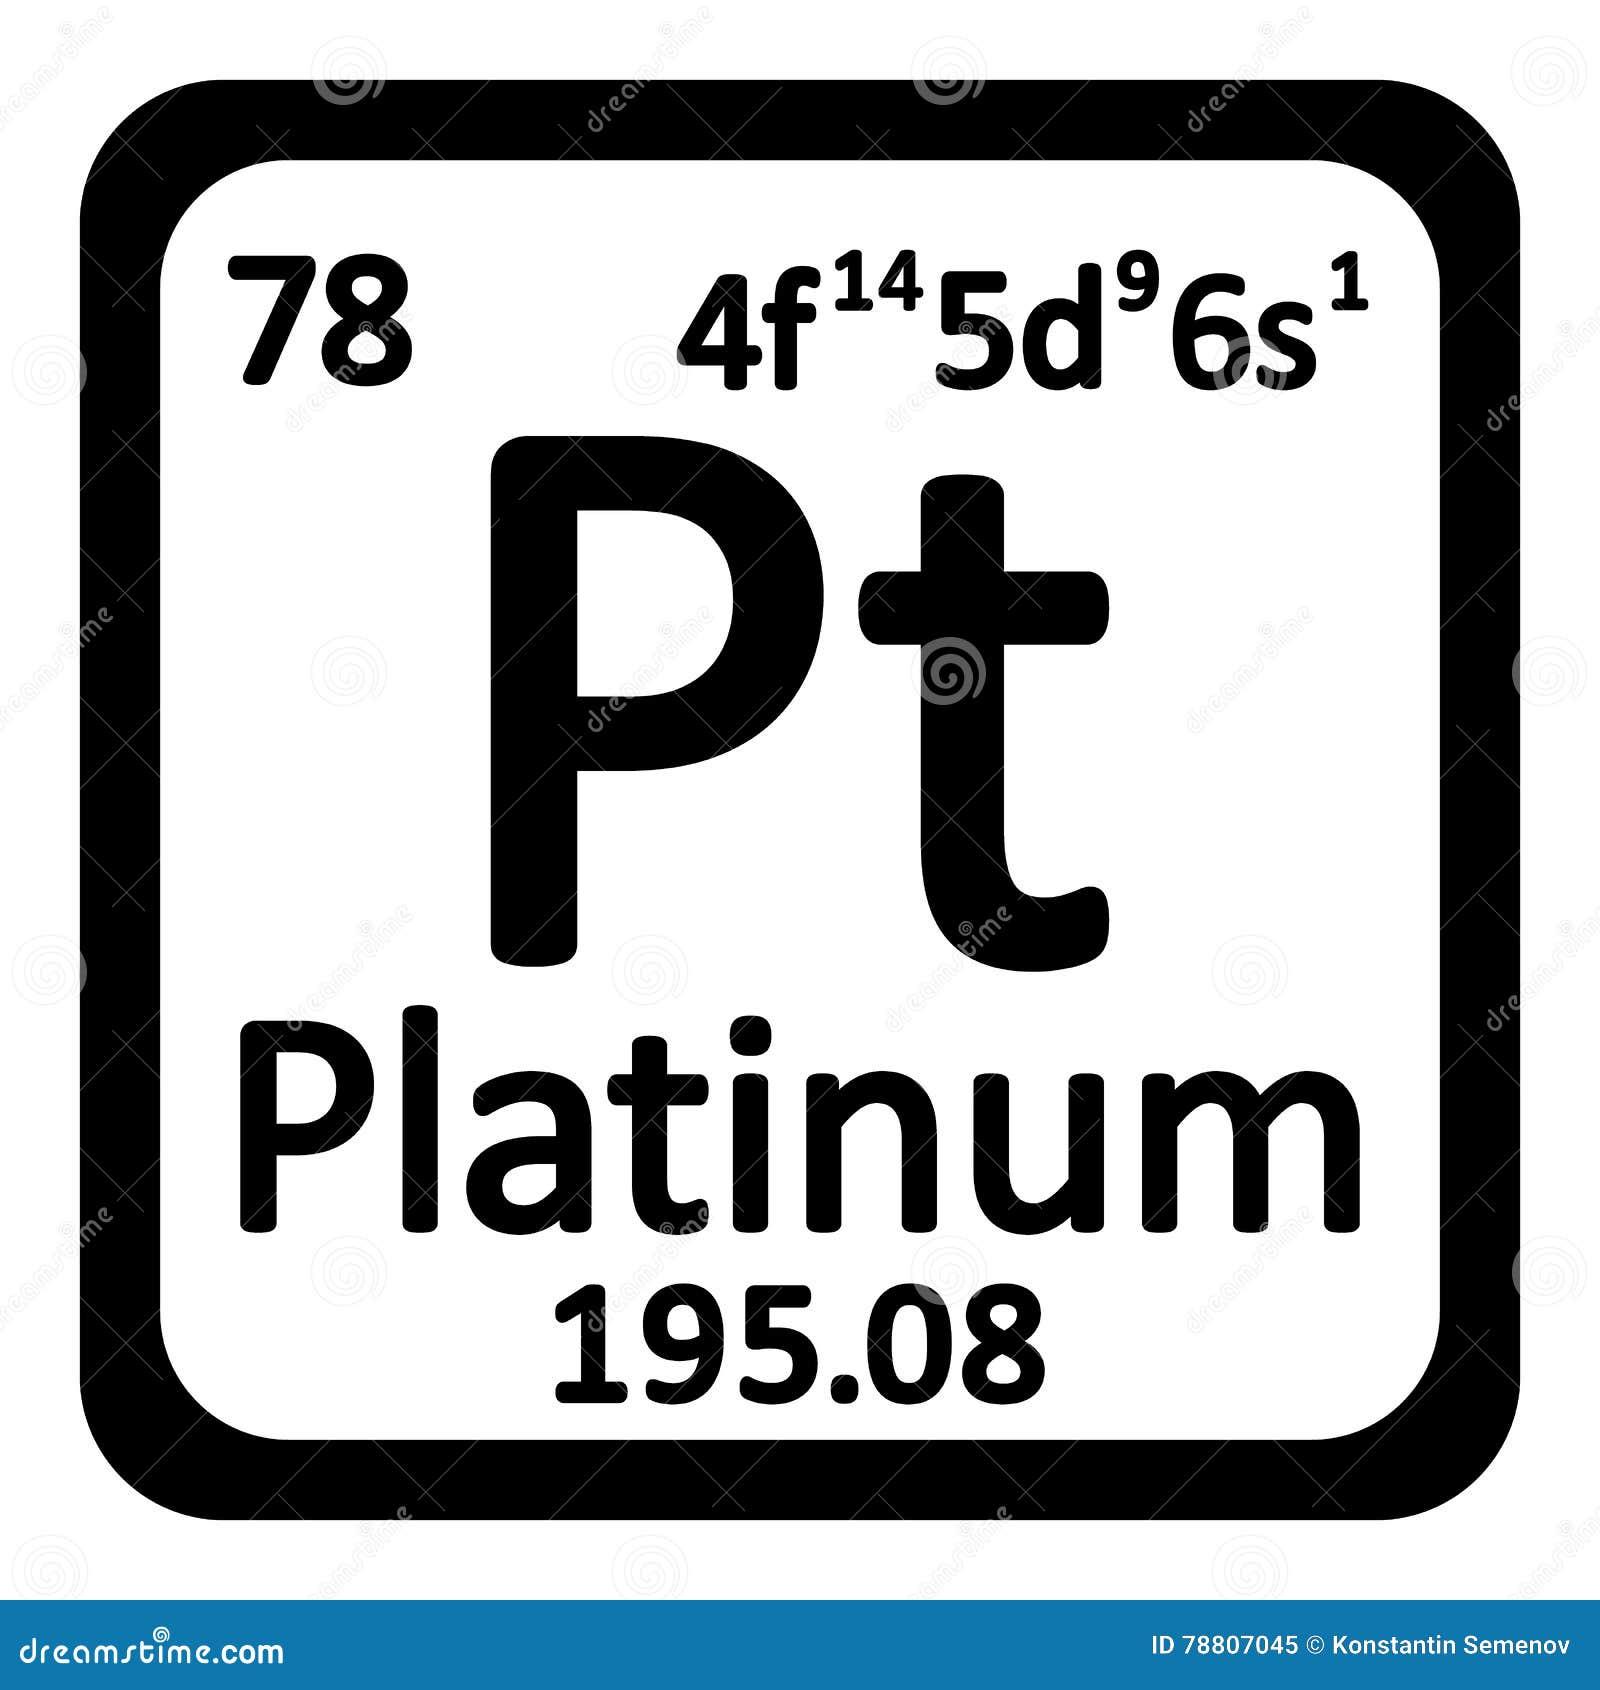 Icono del platino del elemento de tabla peridica stock de download icono del platino del elemento de tabla peridica stock de ilustracin ilustracin de fondo urtaz Choice Image